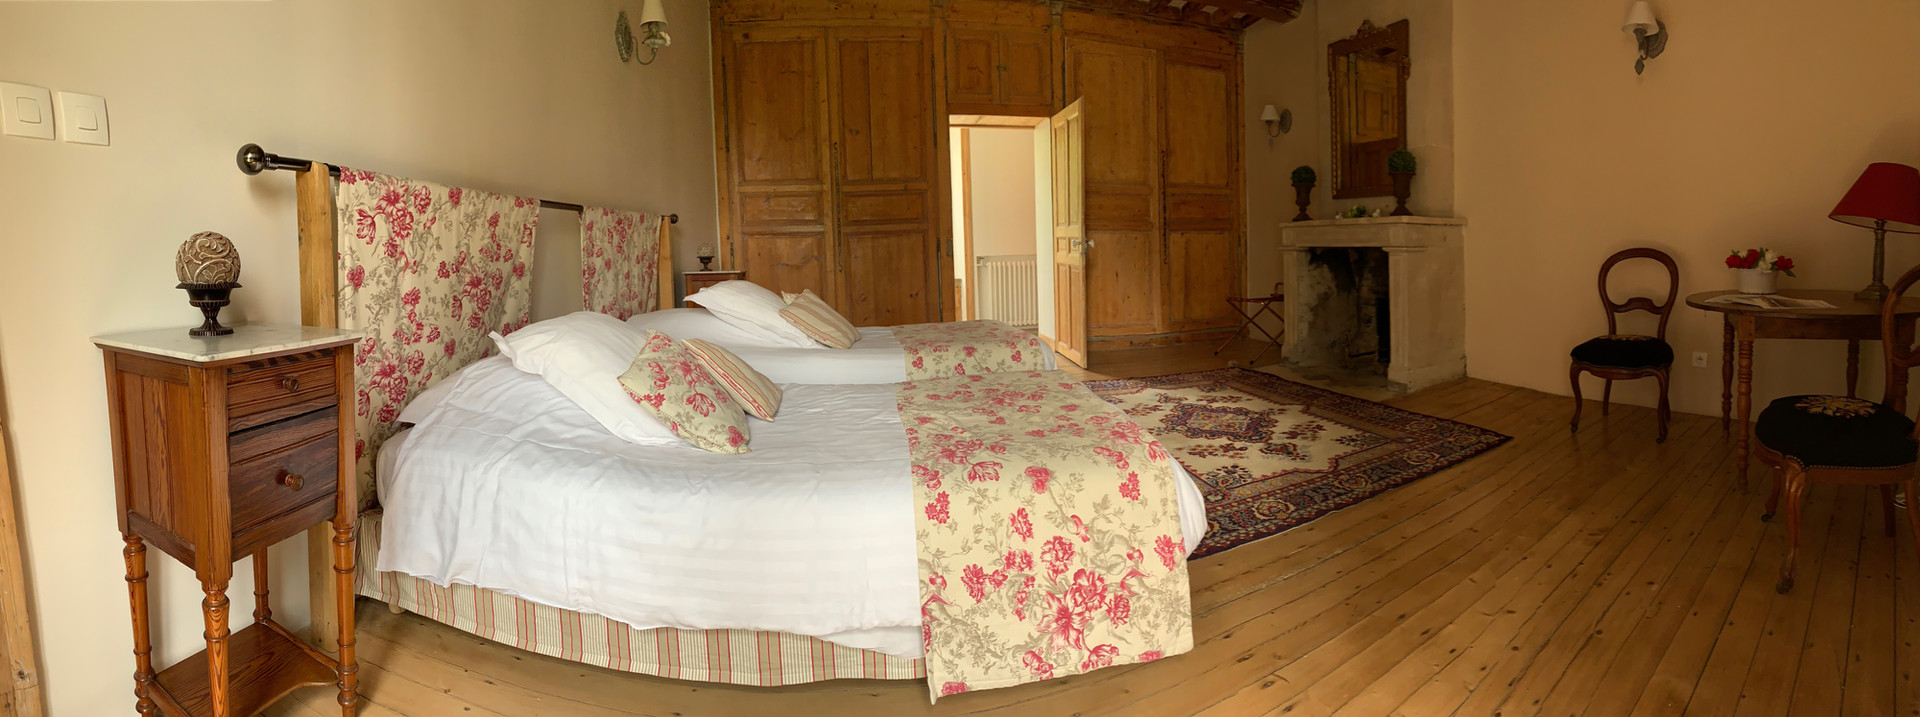 Castellier room